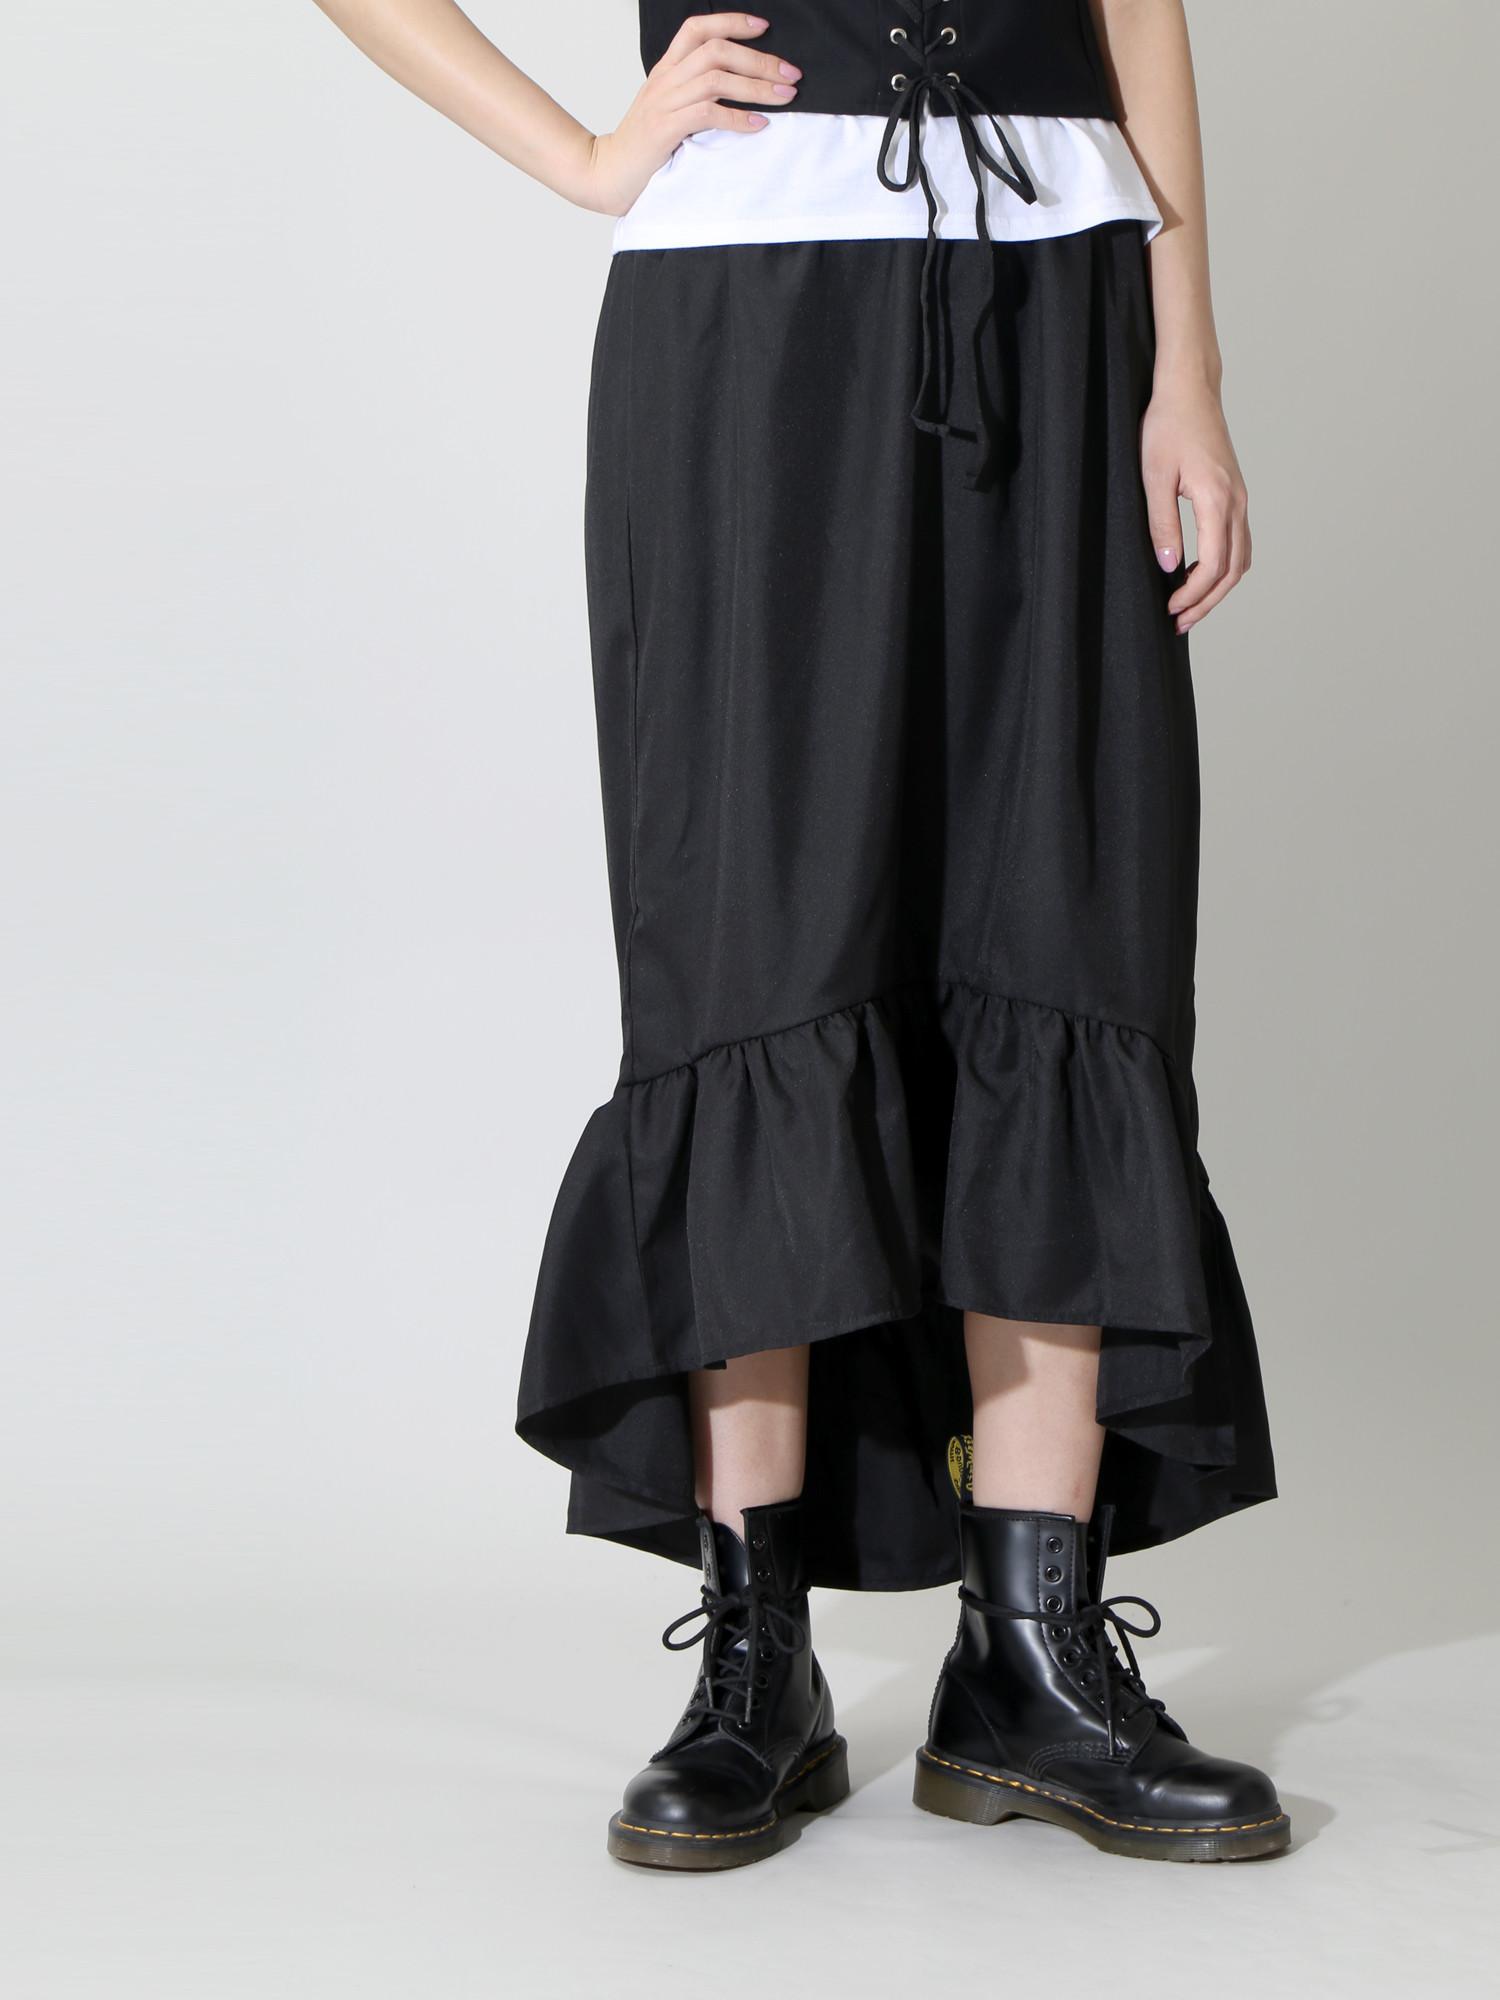 DAMMY/ボリュームアシメスカート